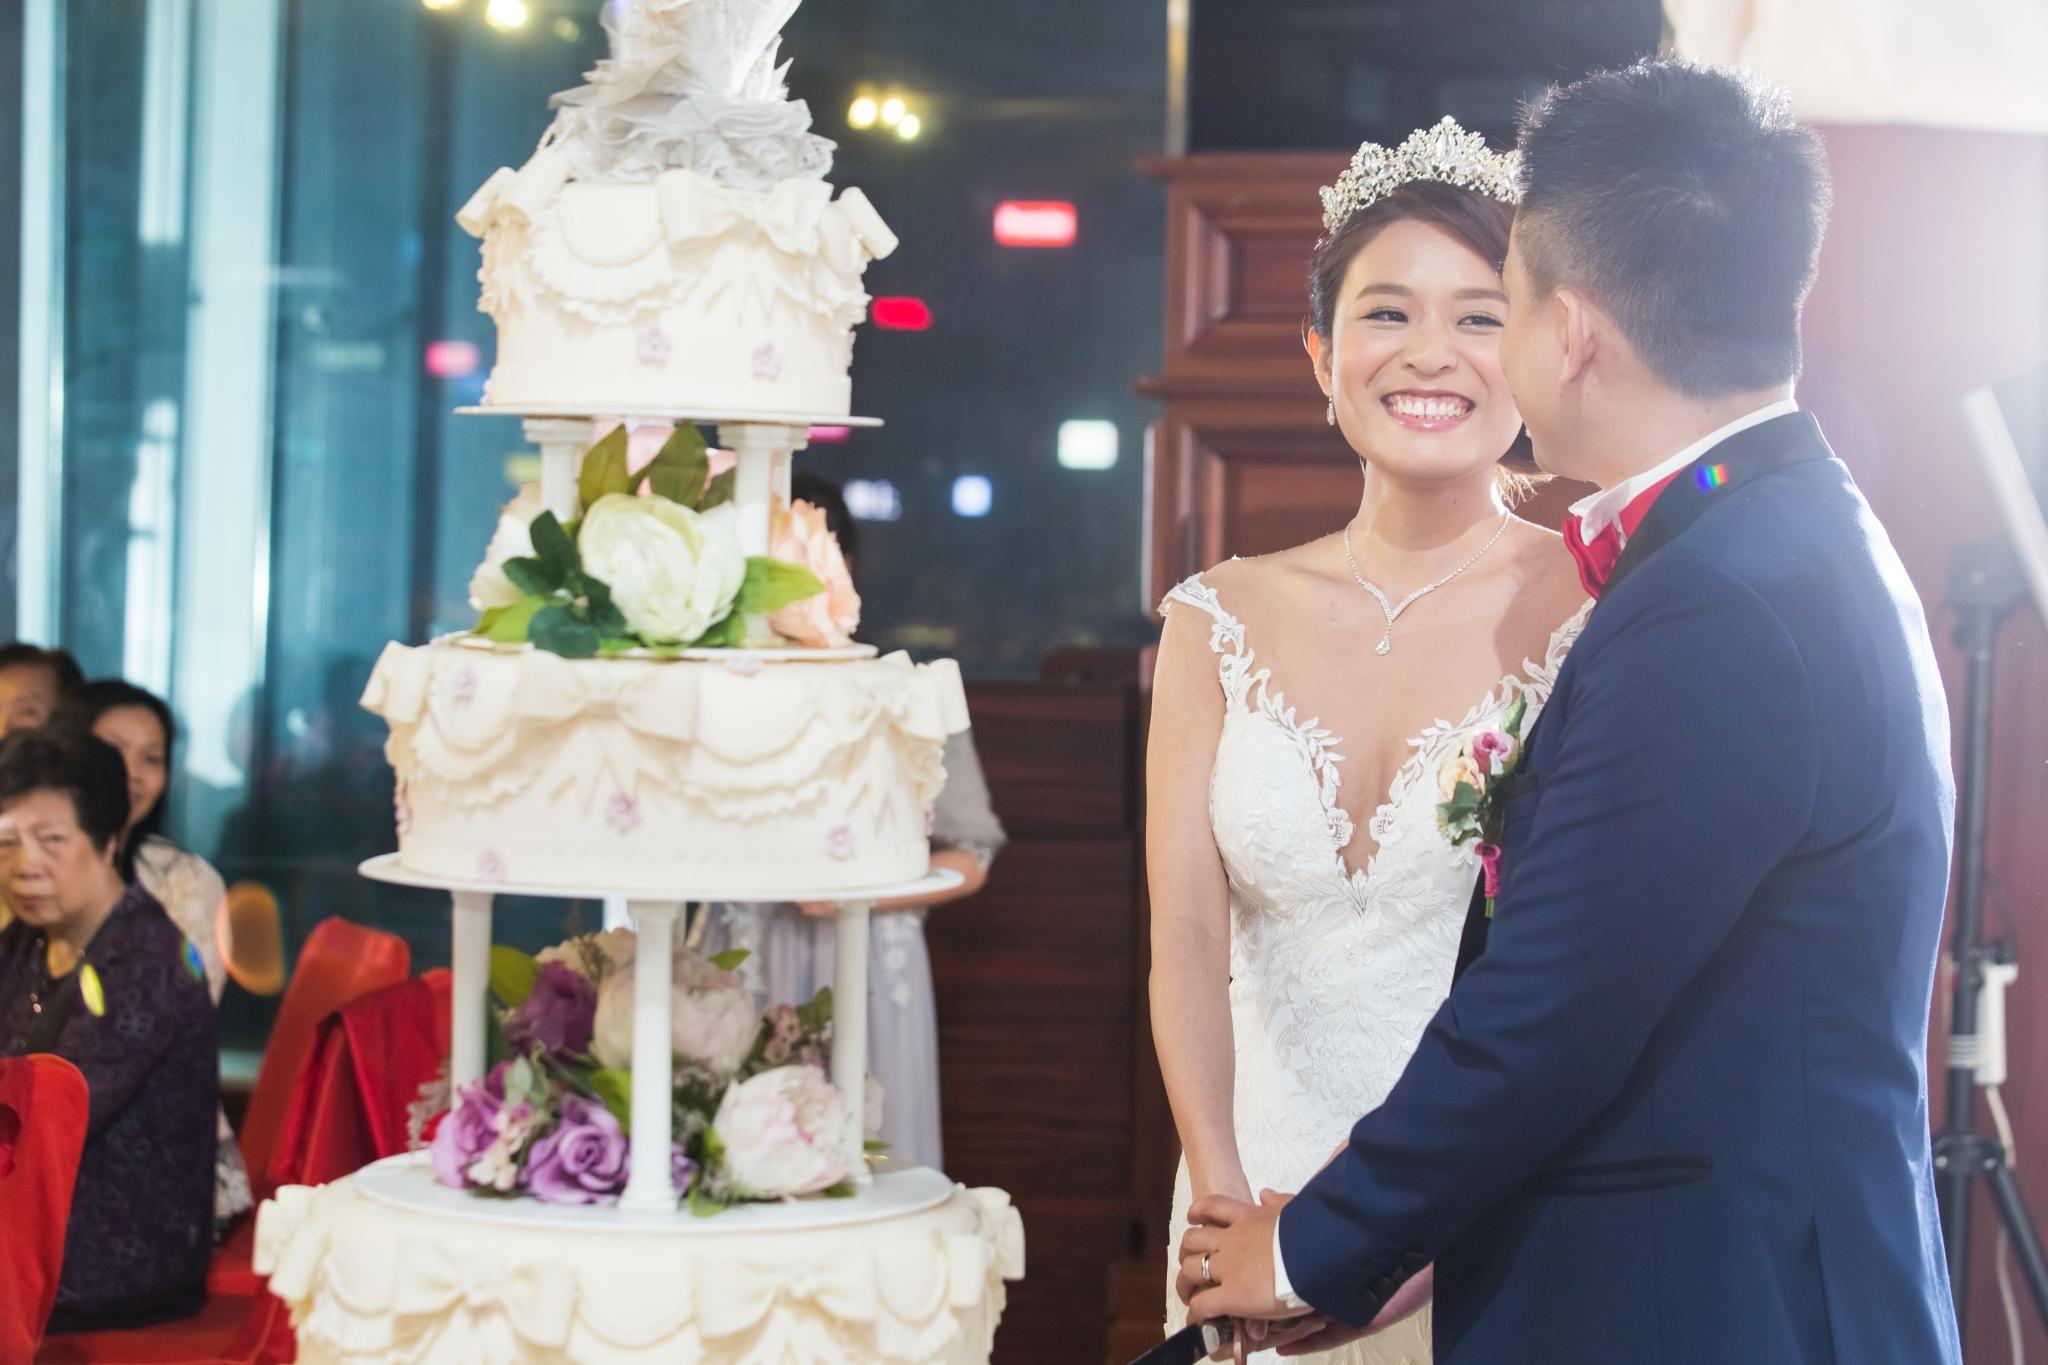 Wedding Reception - 婚宴拍攝作品